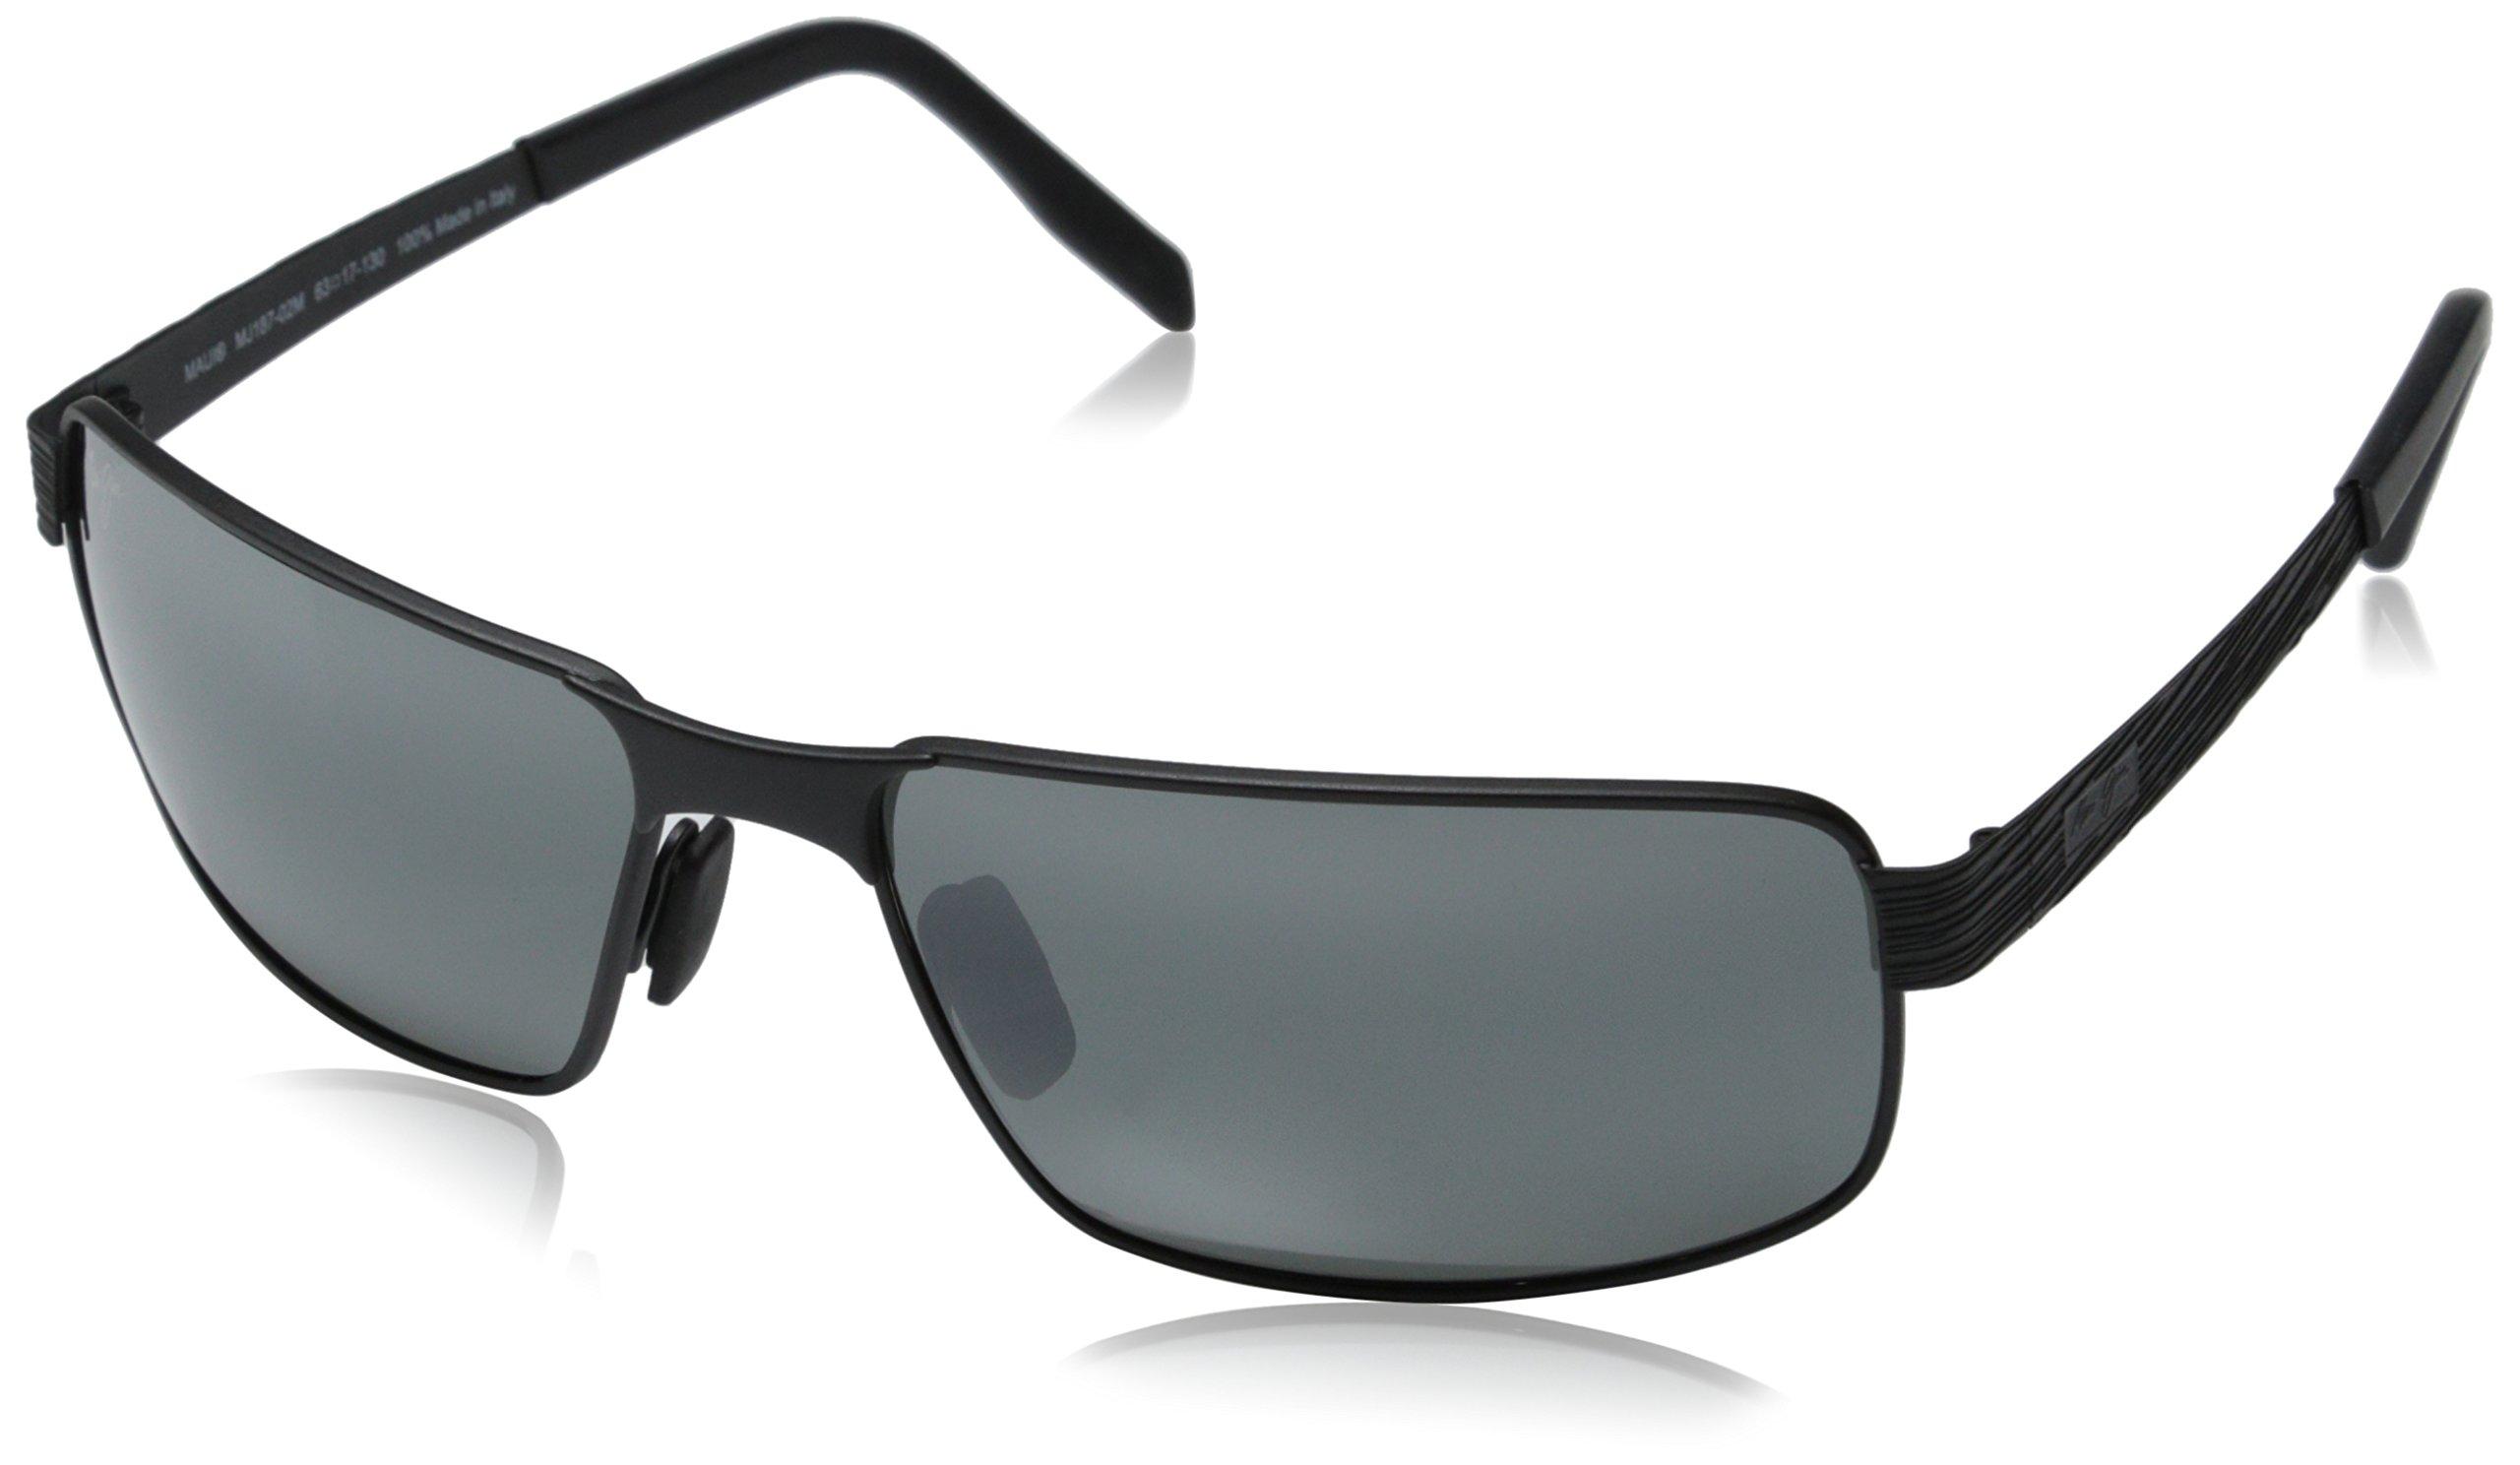 Maui Jim Castaway Sunglasses, Matte Black / Neutral Grey